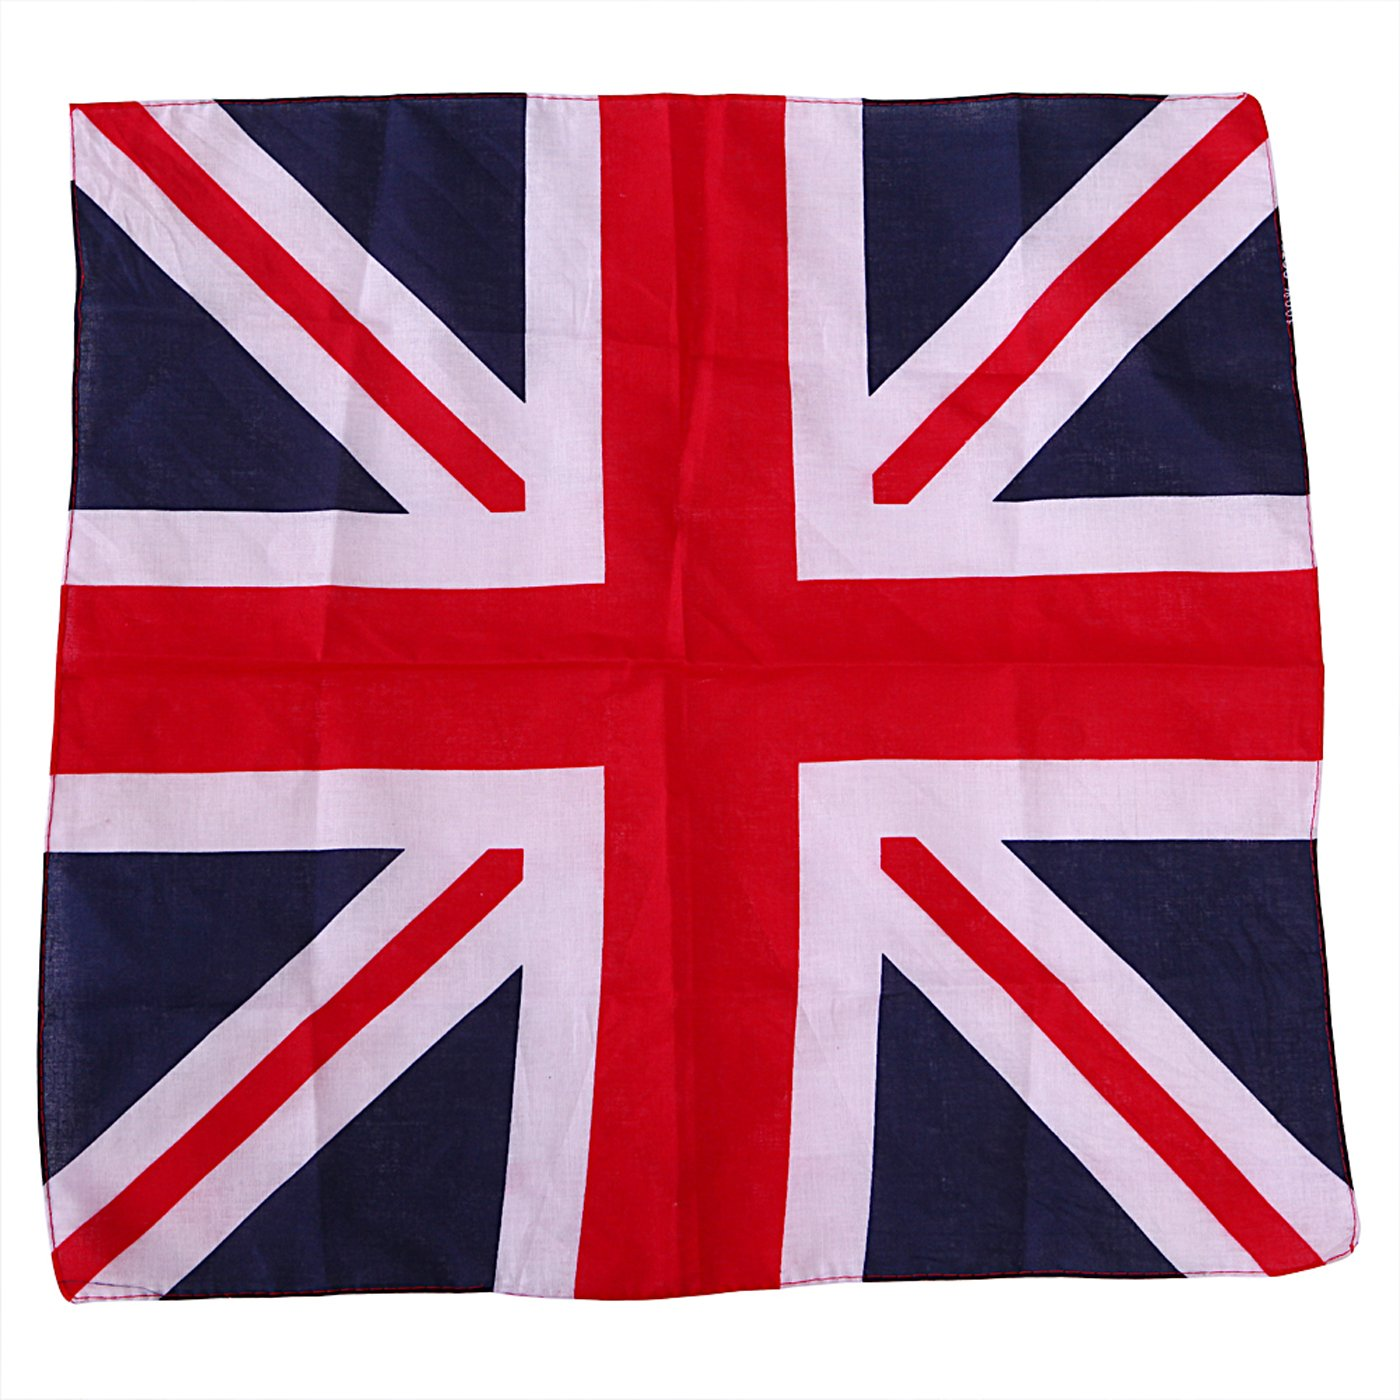 HDE 100% Cotton Bandana - American Flag USA Print HDE-T146